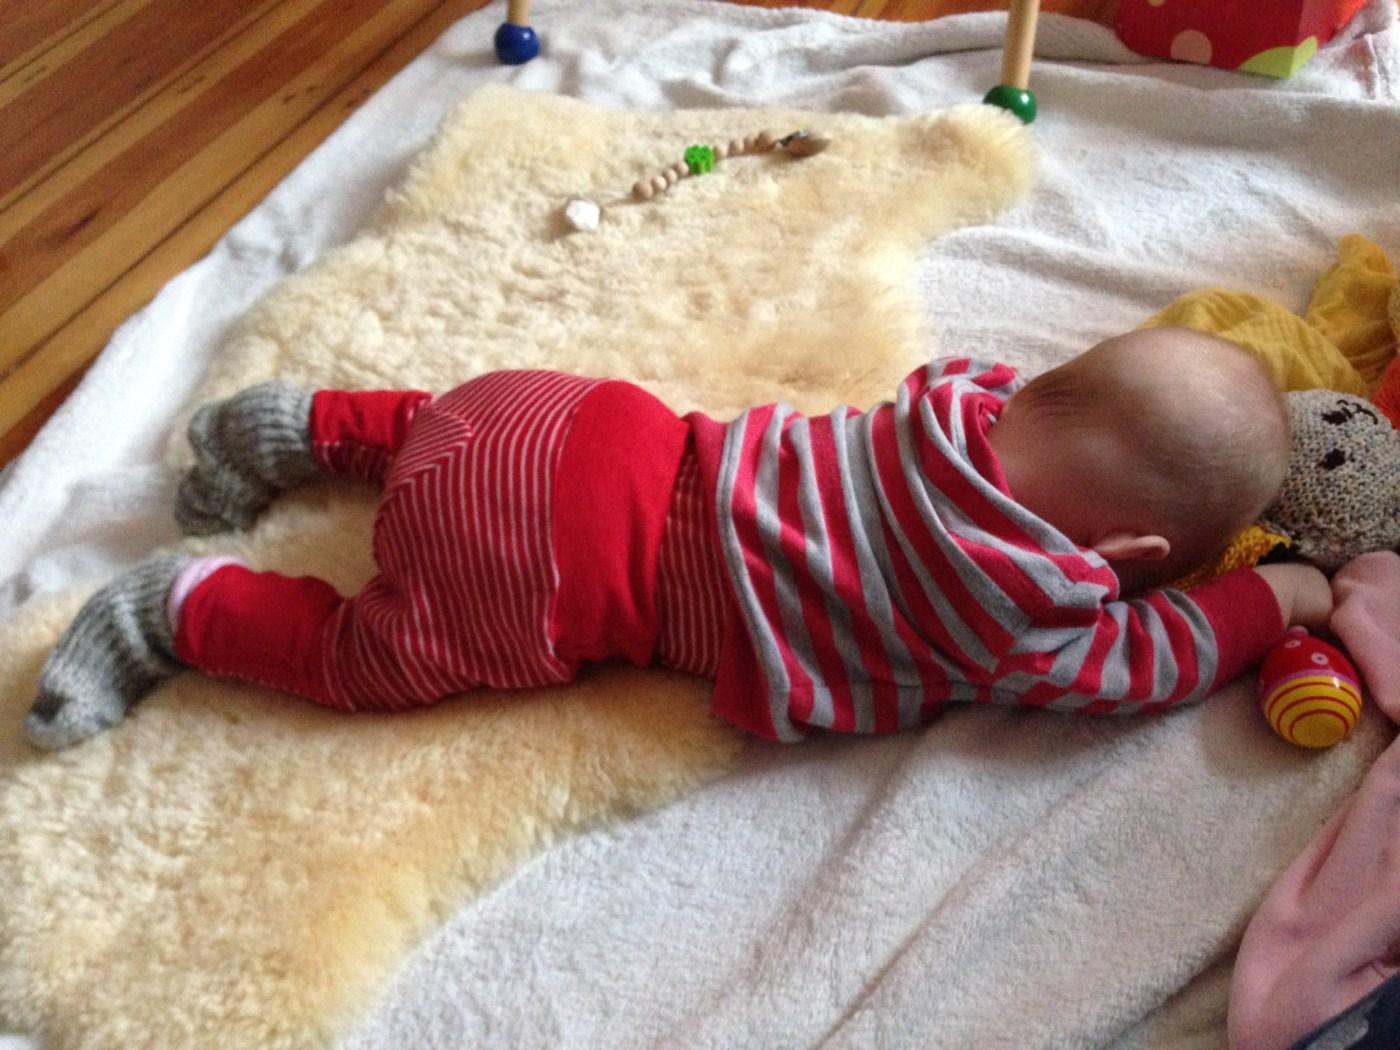 10 steps to save baby sleep